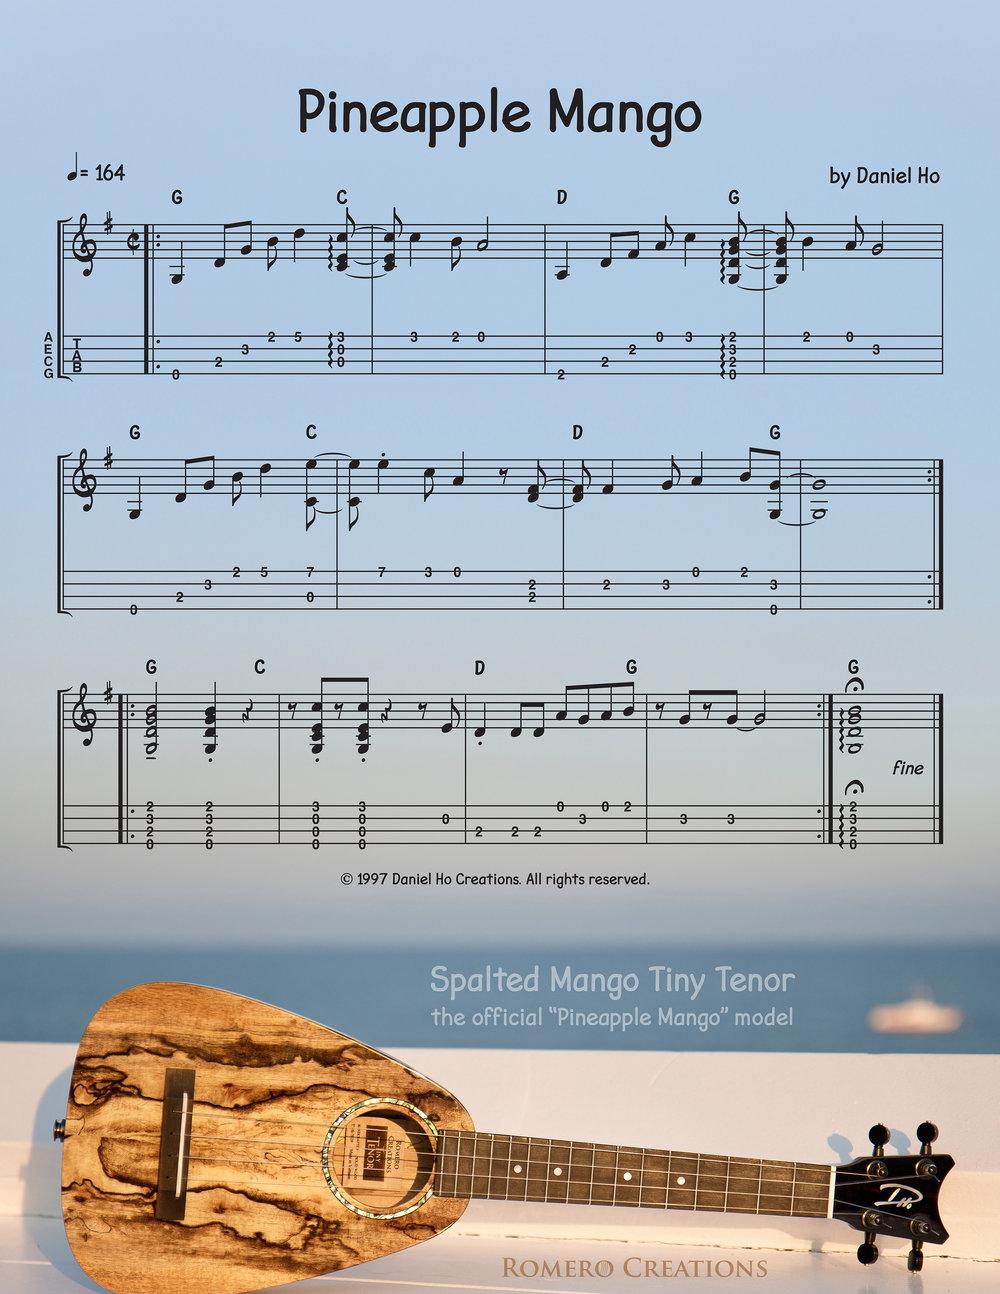 Pineapple-Mango-sheet-music.jpg